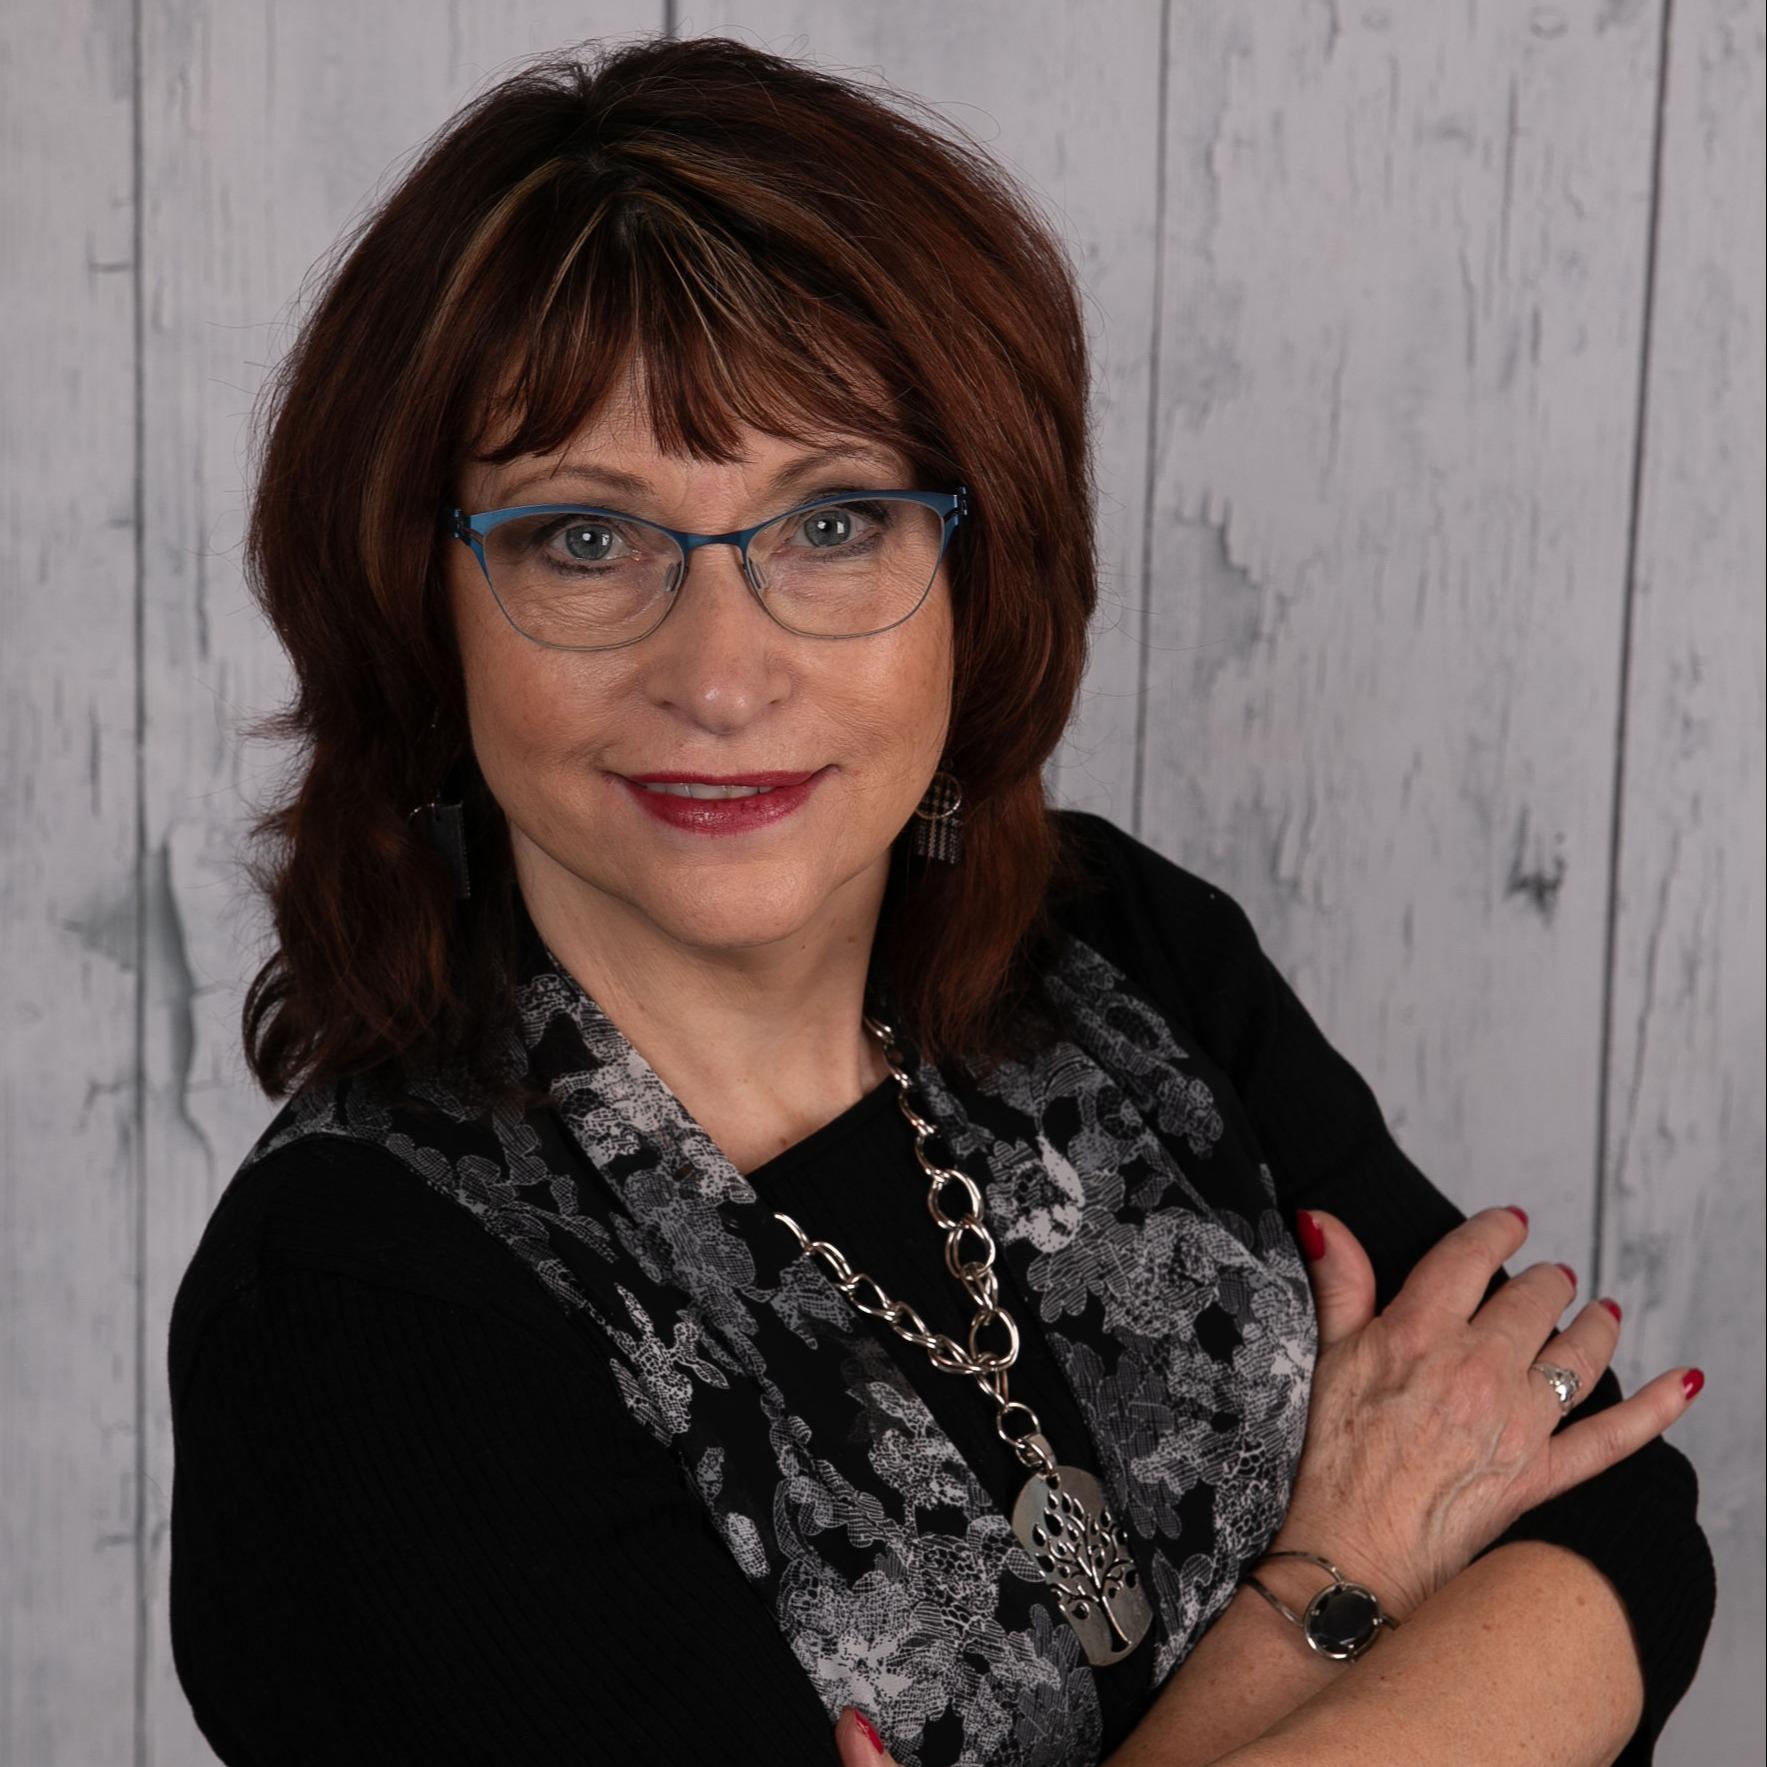 Teresa Lunde